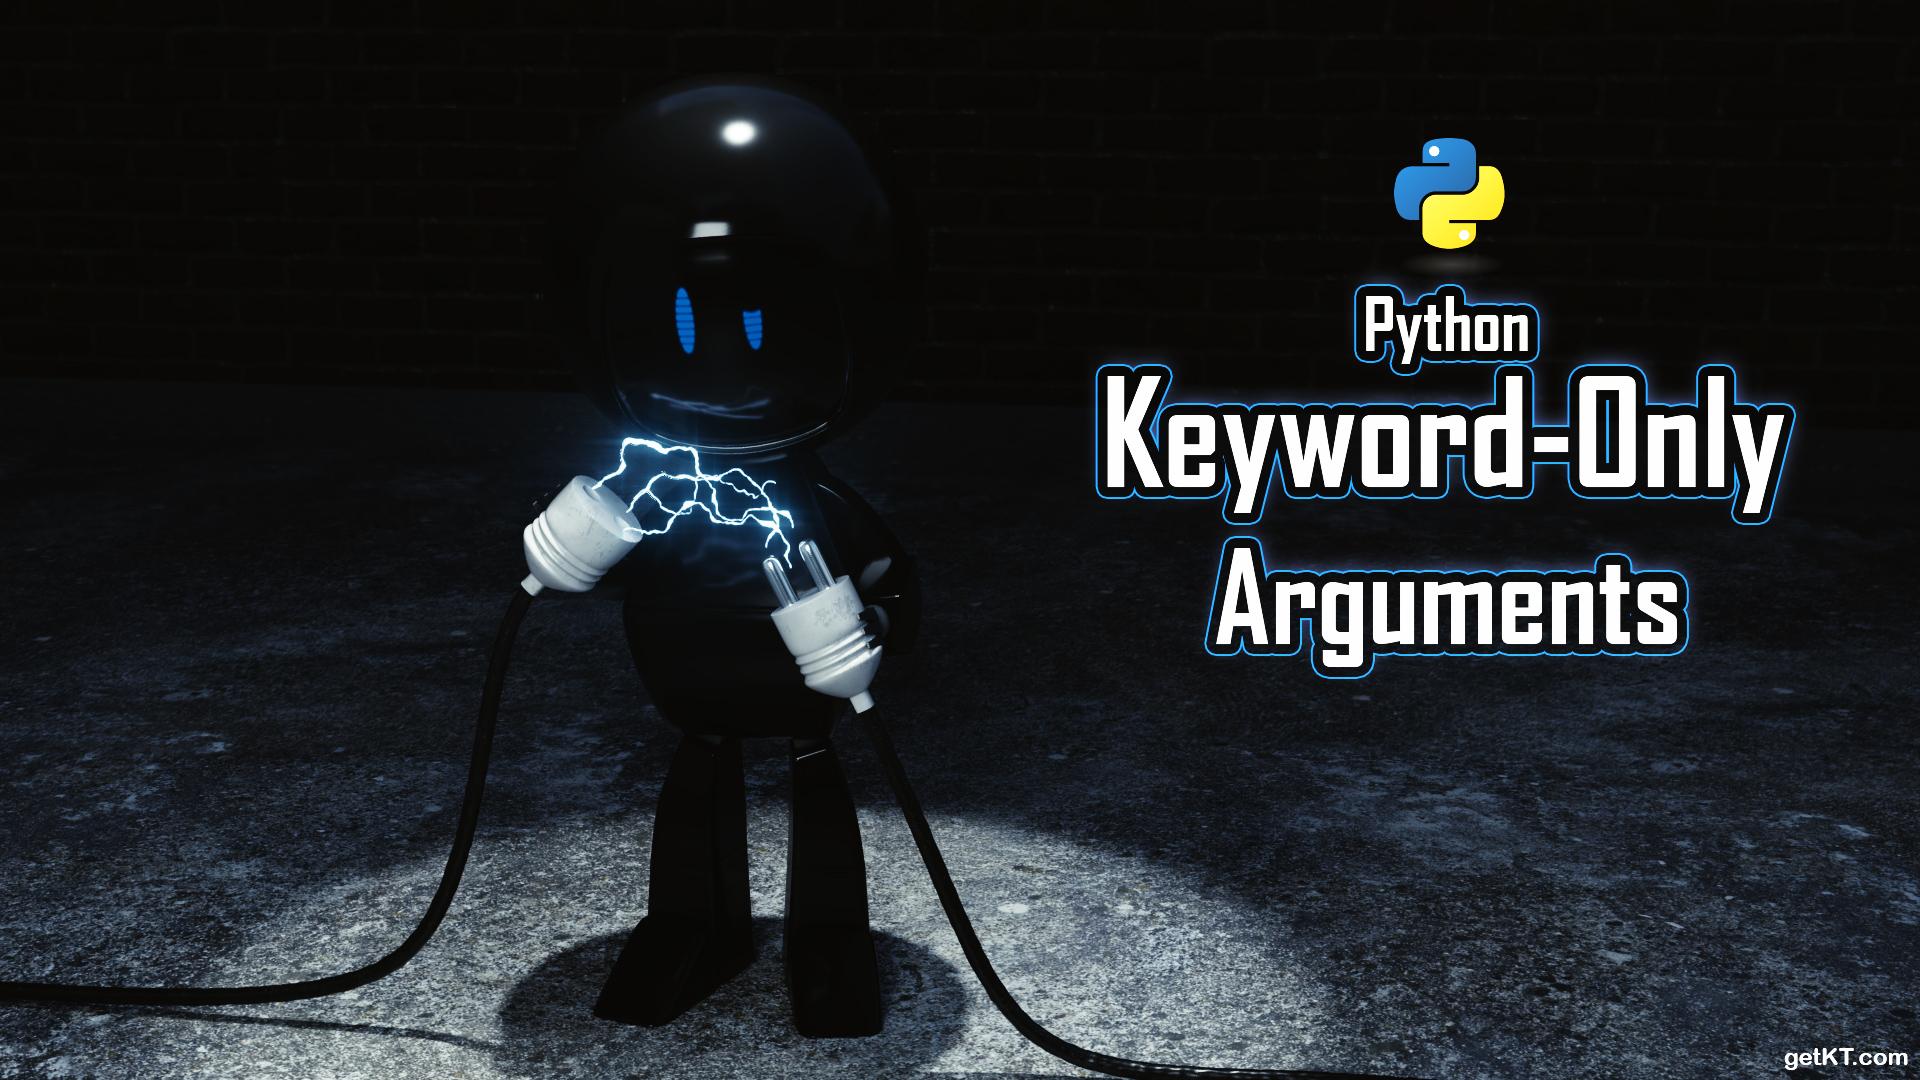 Python Keyword-Only Arguments